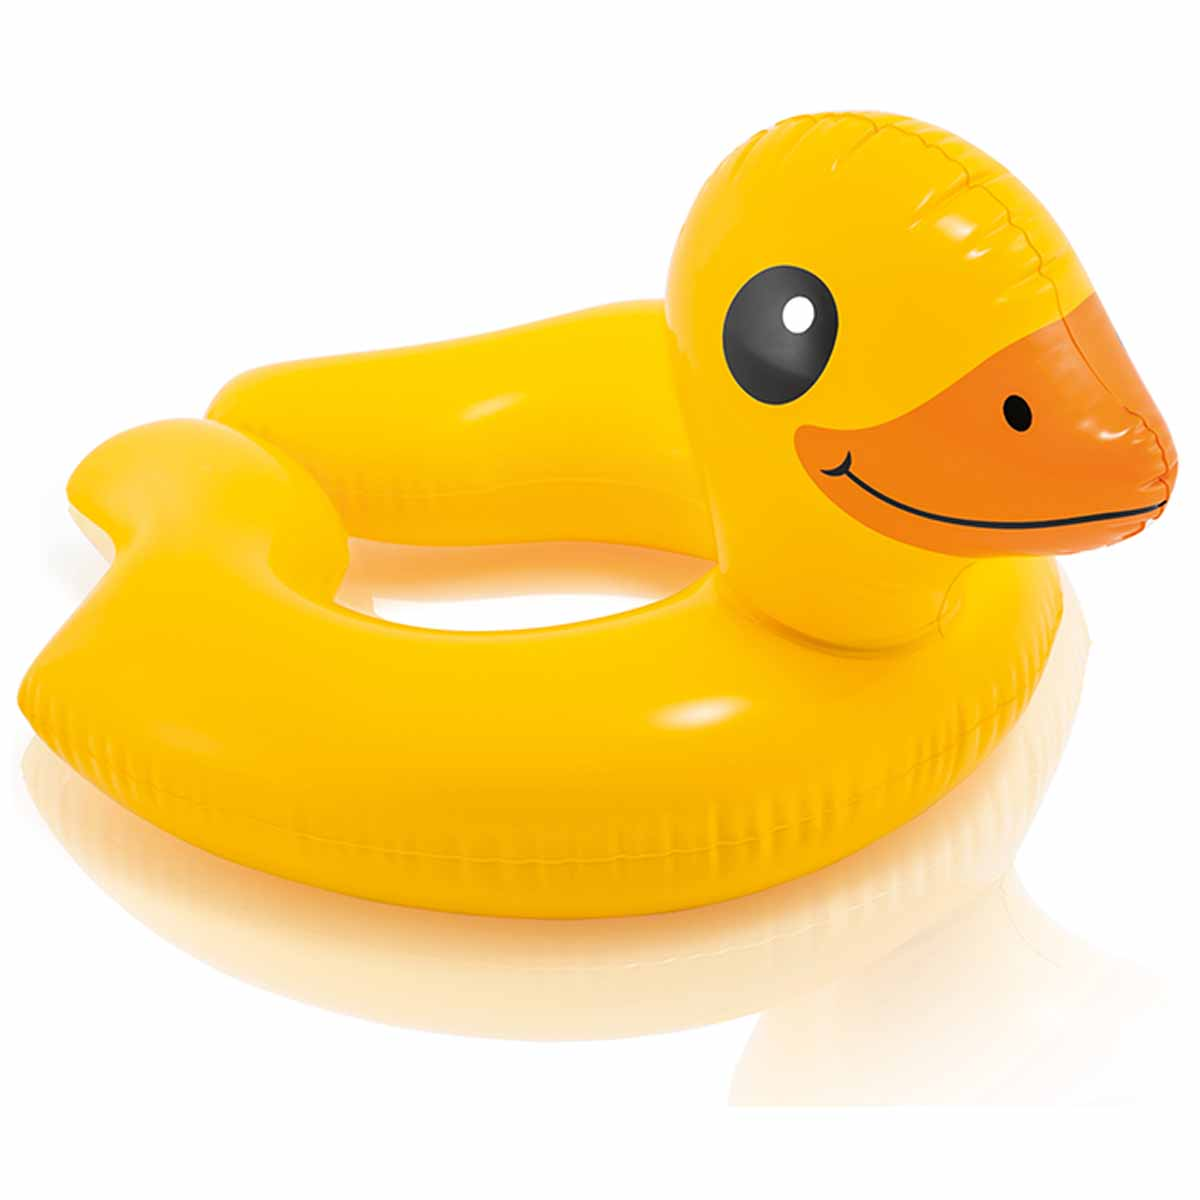 Flotador Salvavidas Inflable Pingüino Pato o Flamingo Intex